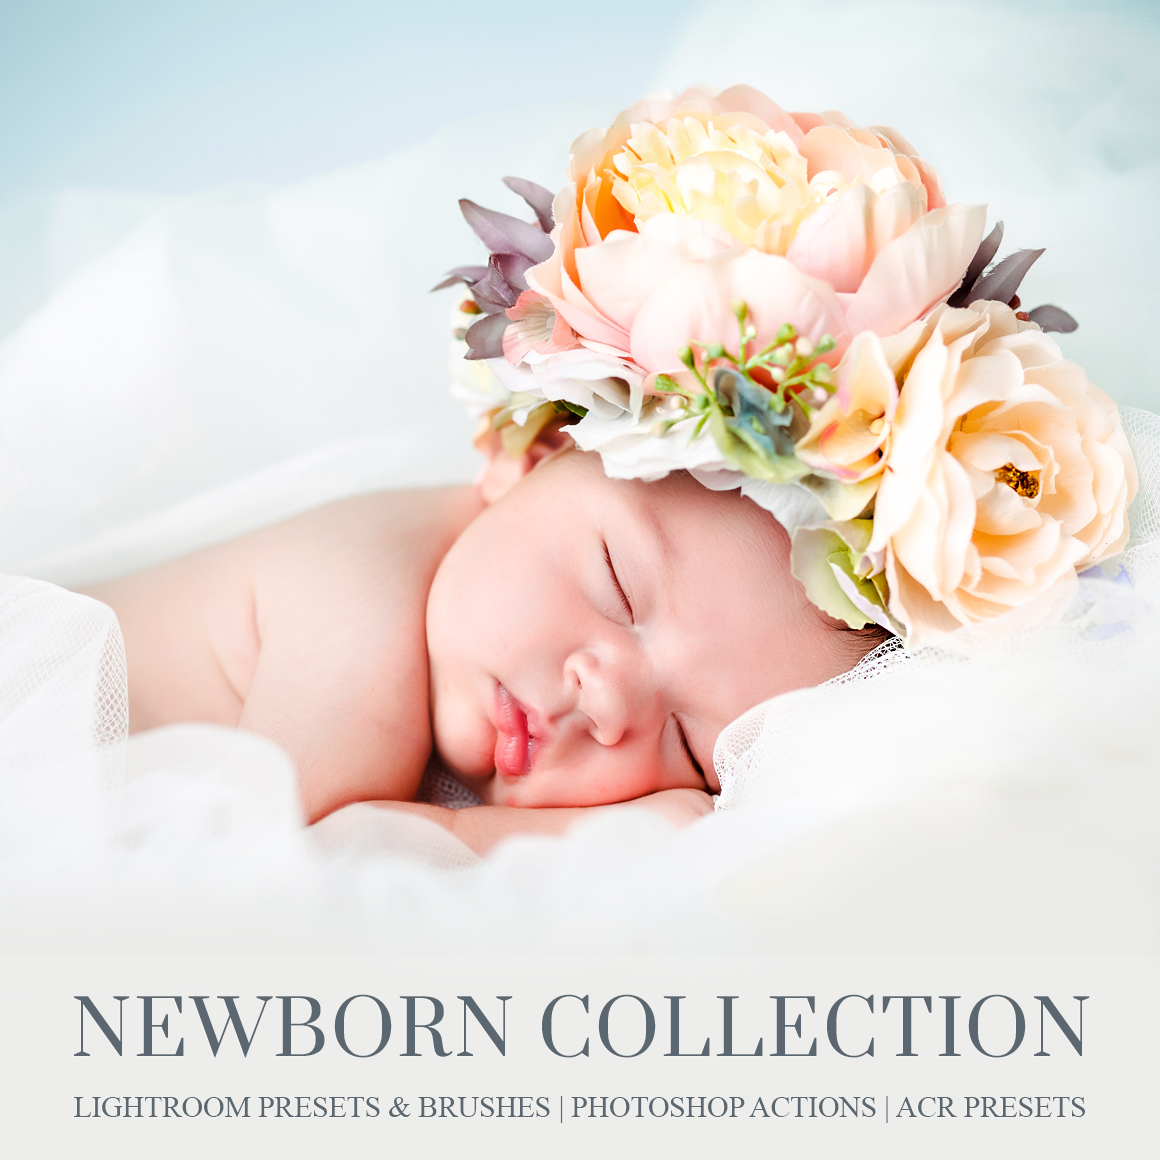 23d7ca6958c Newborn lightroom presets, photoshop actions and acr presets